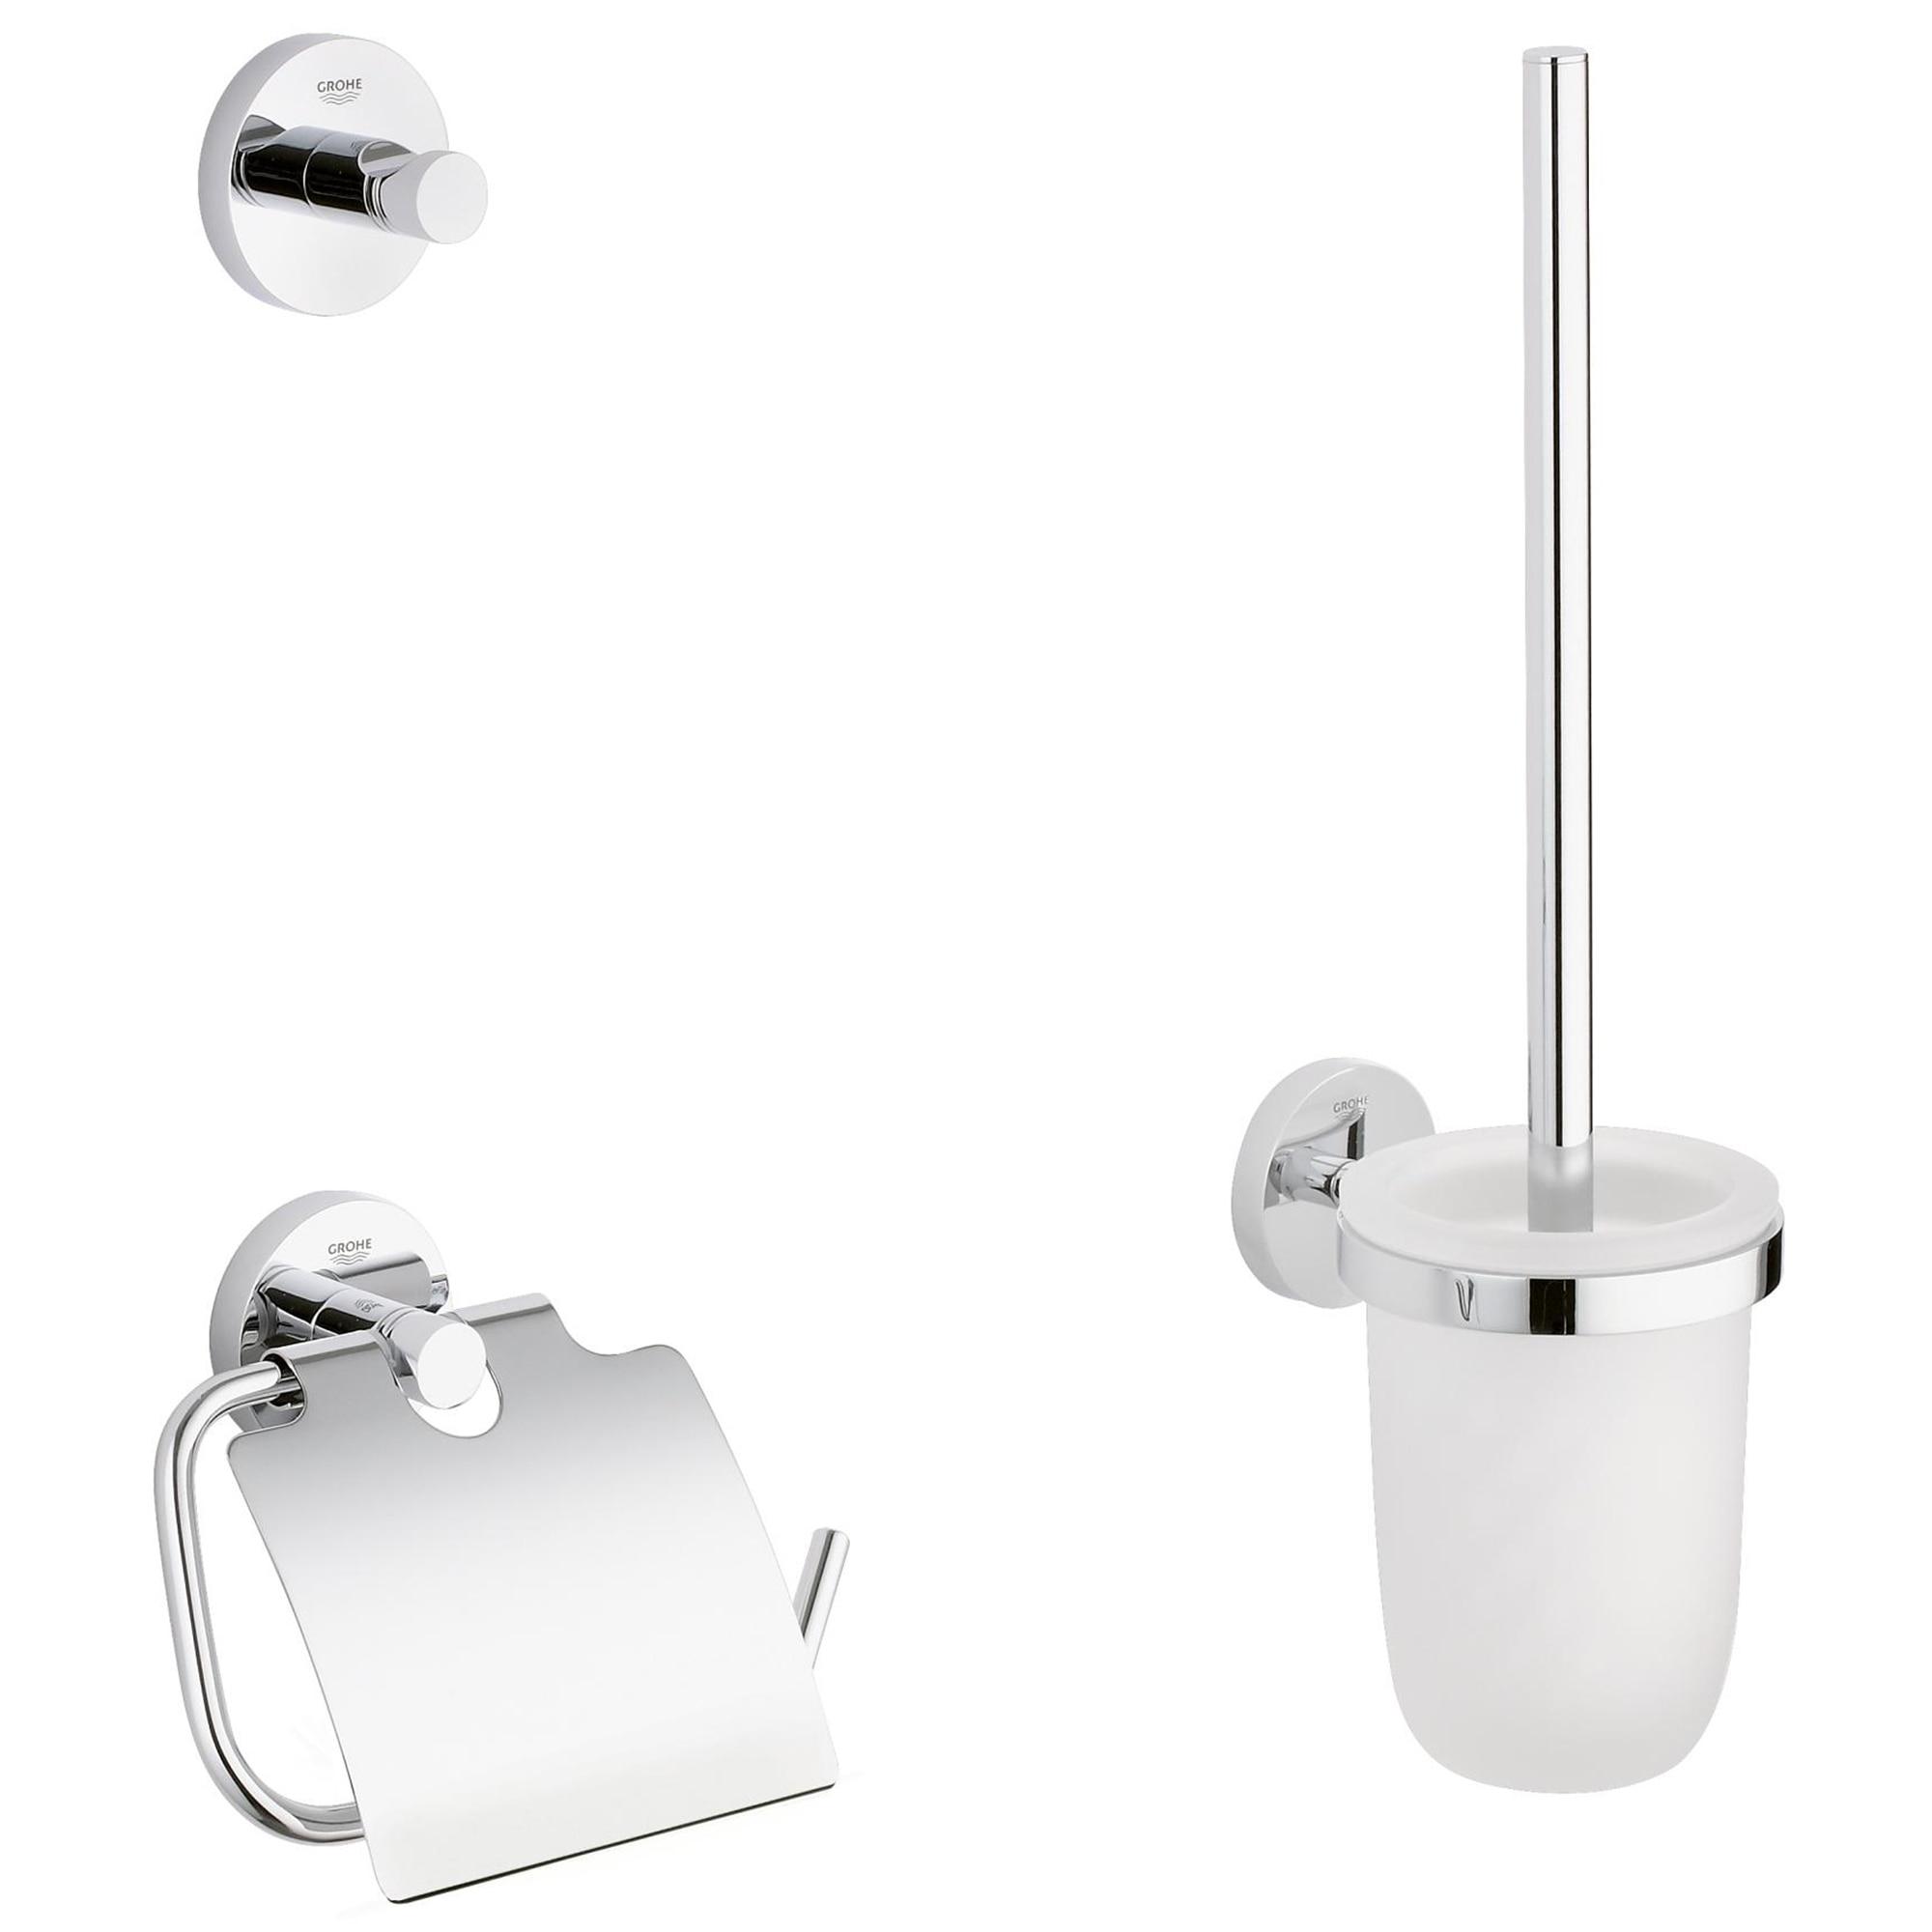 Fotografie Set accesorii baie Grohe Essentials City 3 in 1, perie WC cu suport, suport hartie igienica, cuier prosop, fixare ascunsa, crom